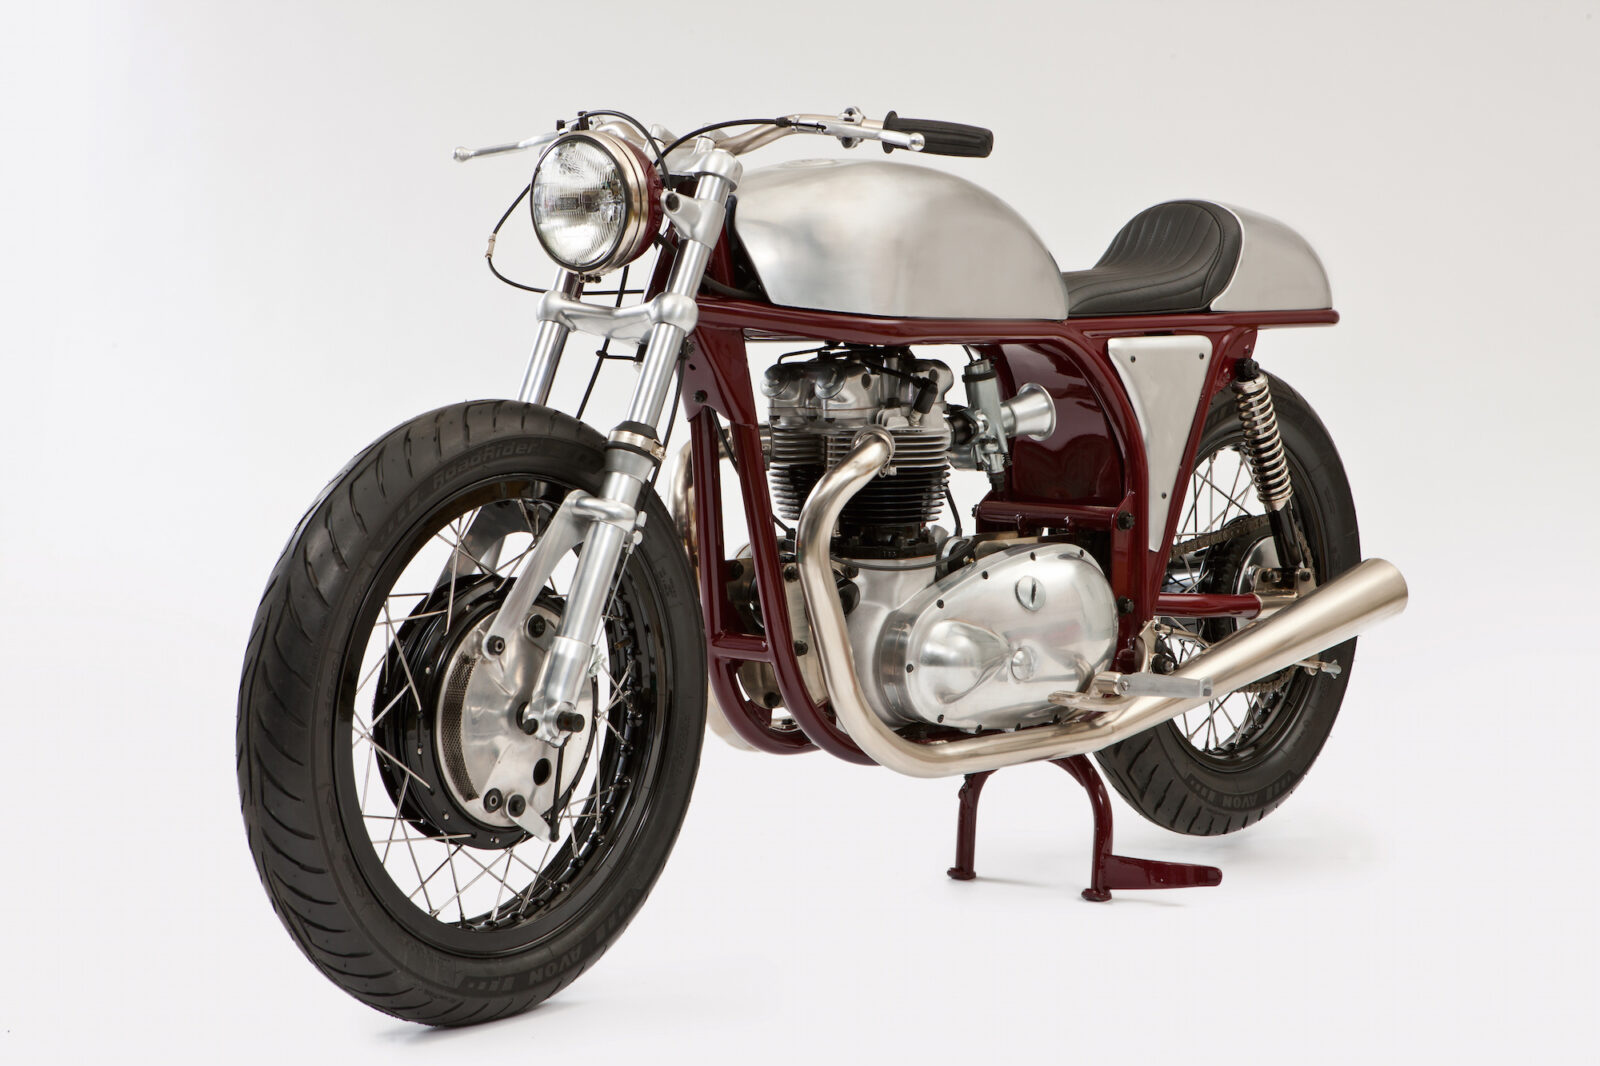 Triton Motorcycle 10 1600x1066 - Triton by The GasBox